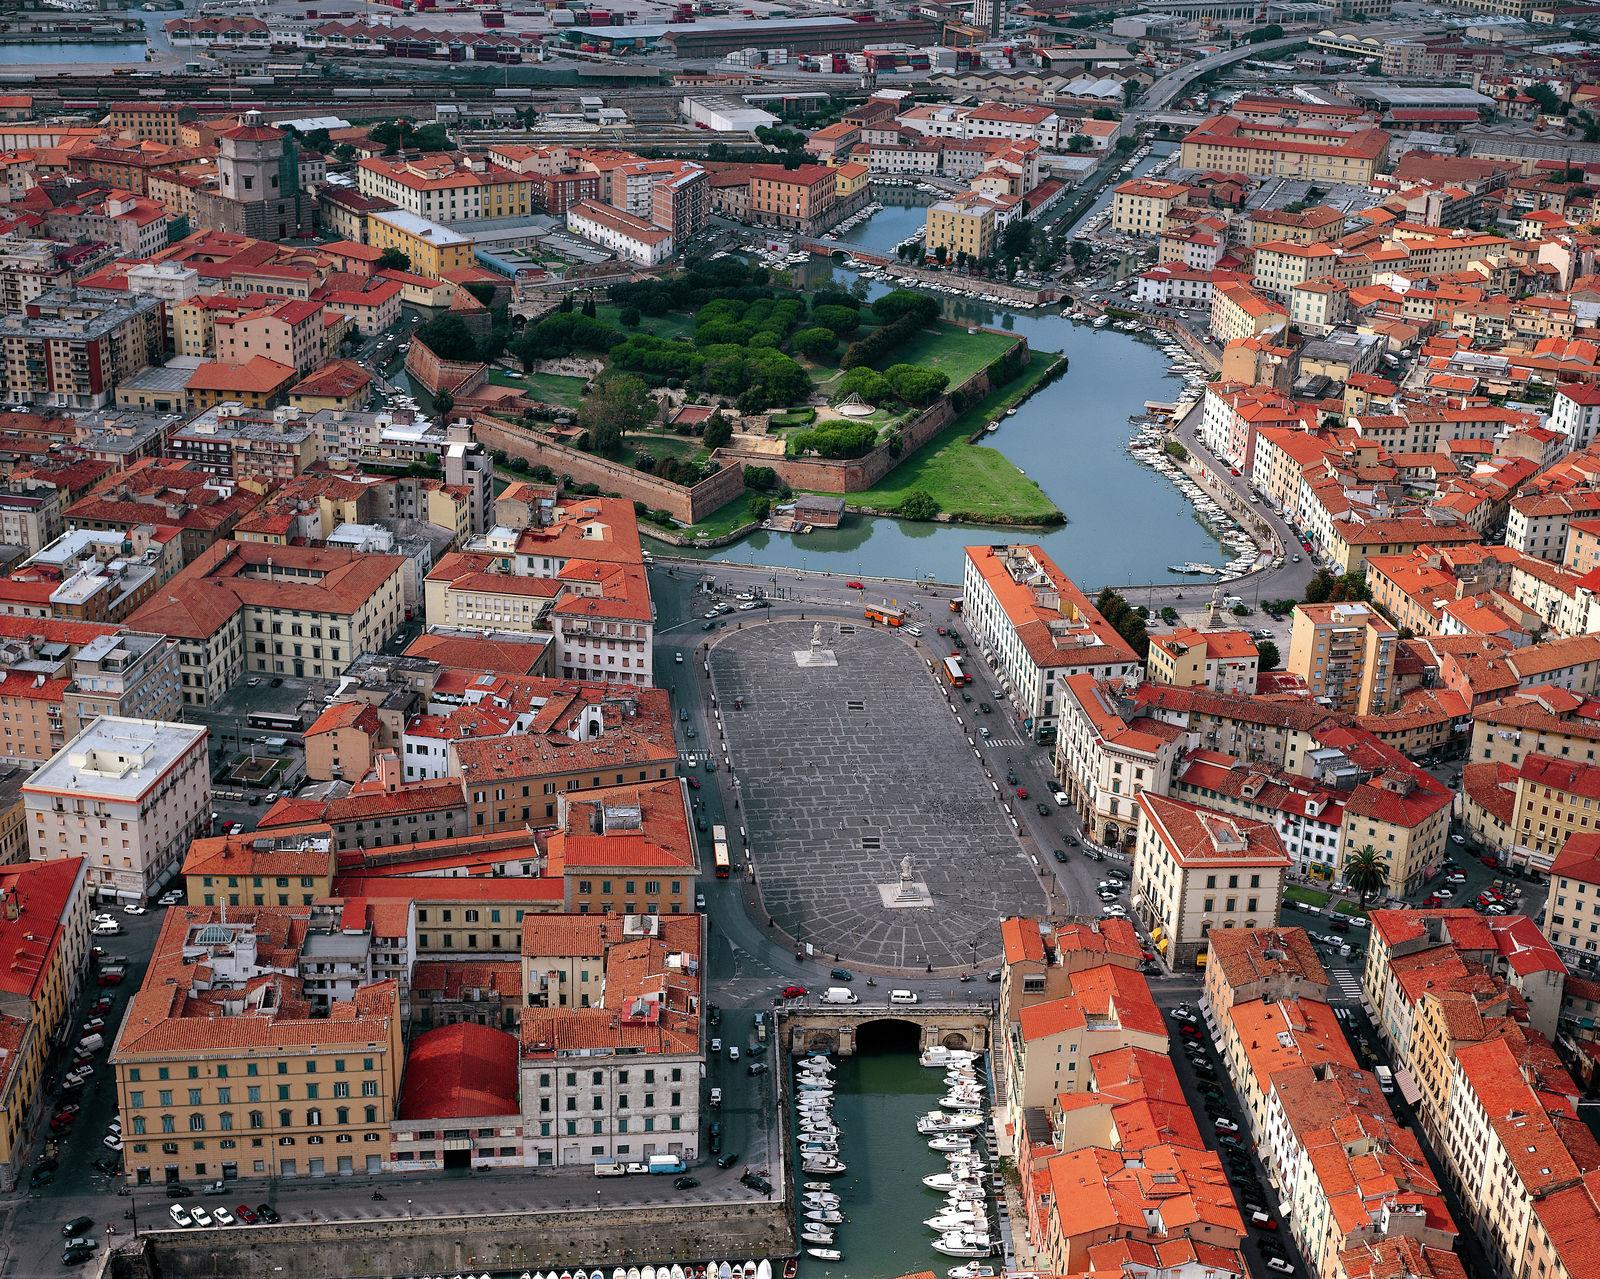 Livorno - Medici City of the Nations